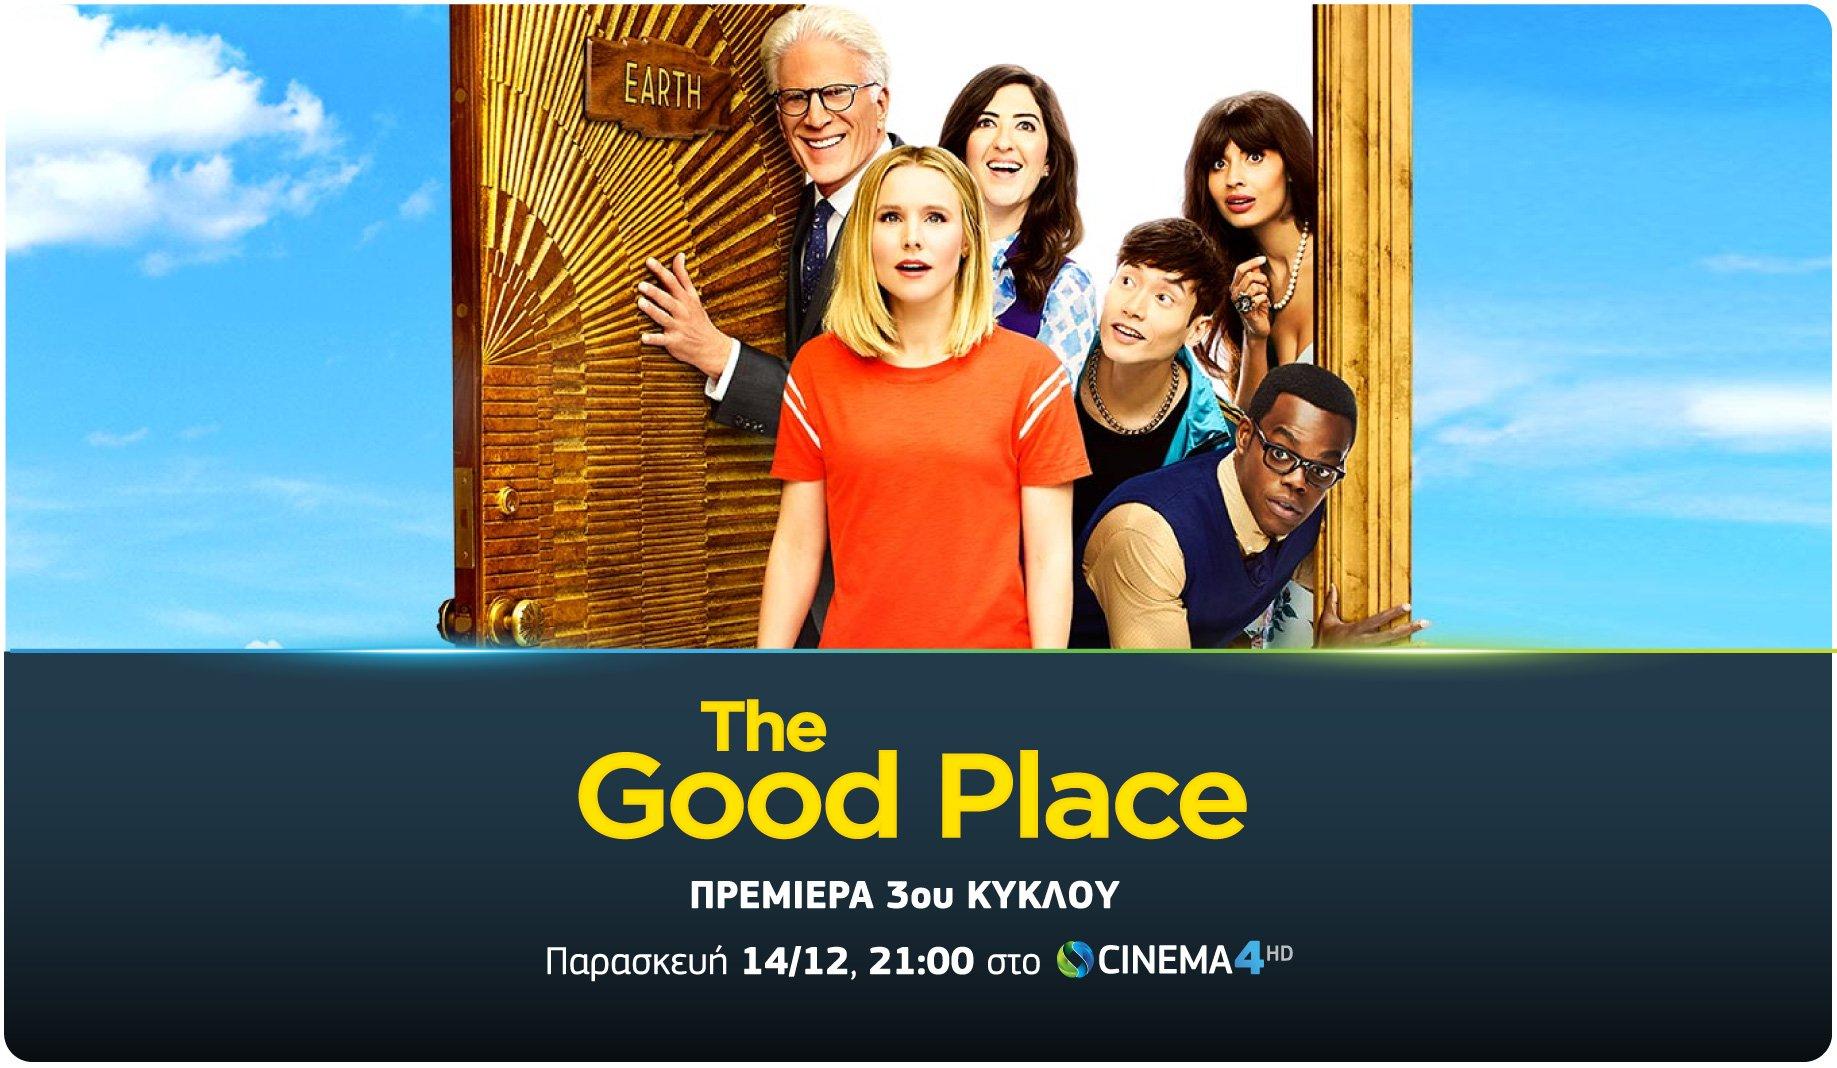 """The Good Place"": Ο 3ος κύκλος της κωμικής σειράς έρχεται στην COSMOTE TV"